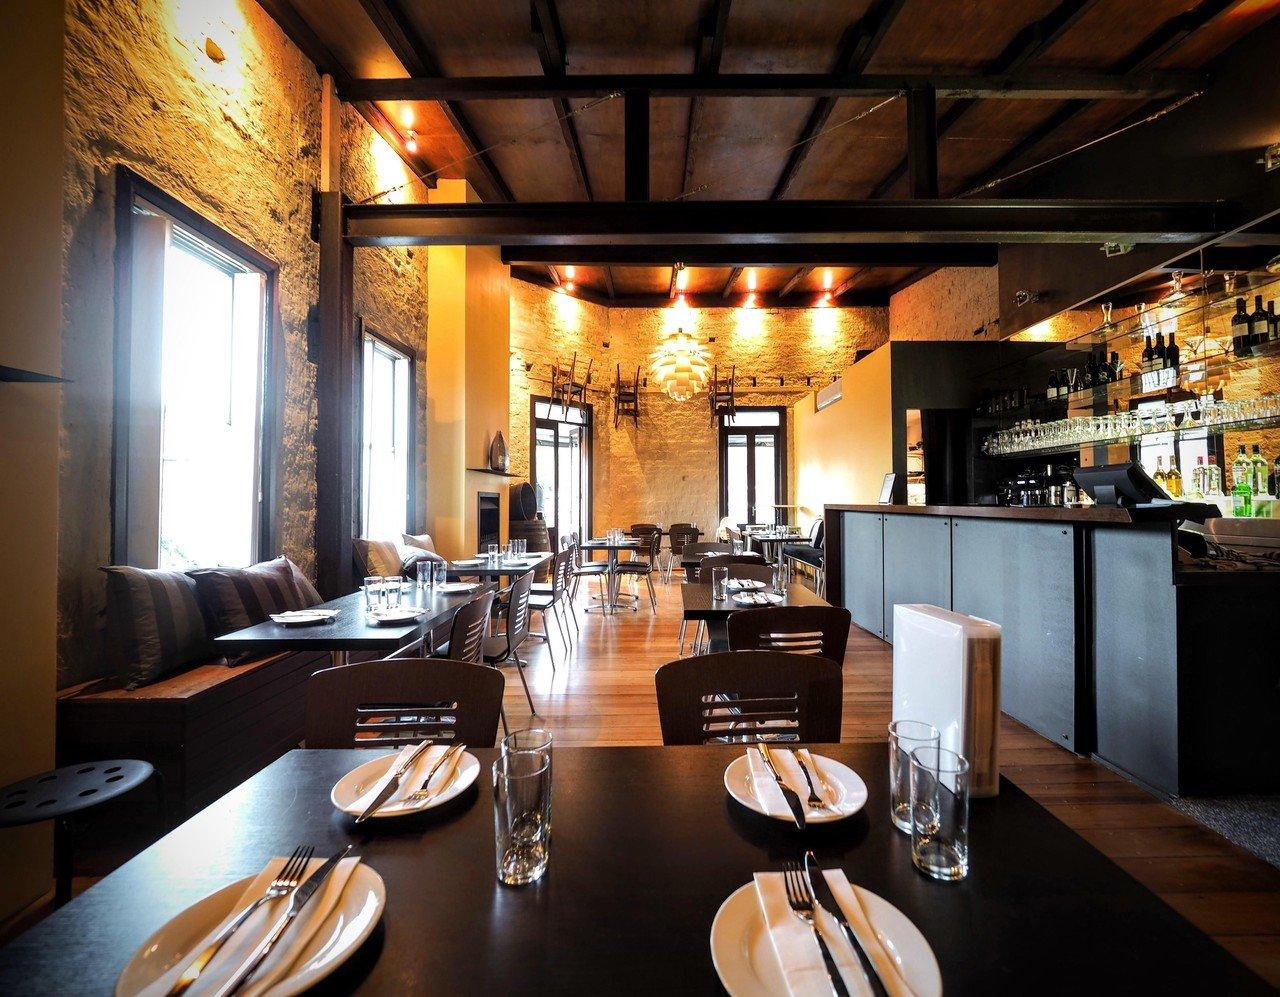 Sydney corporate event spaces Restaurant Restaurant image 0